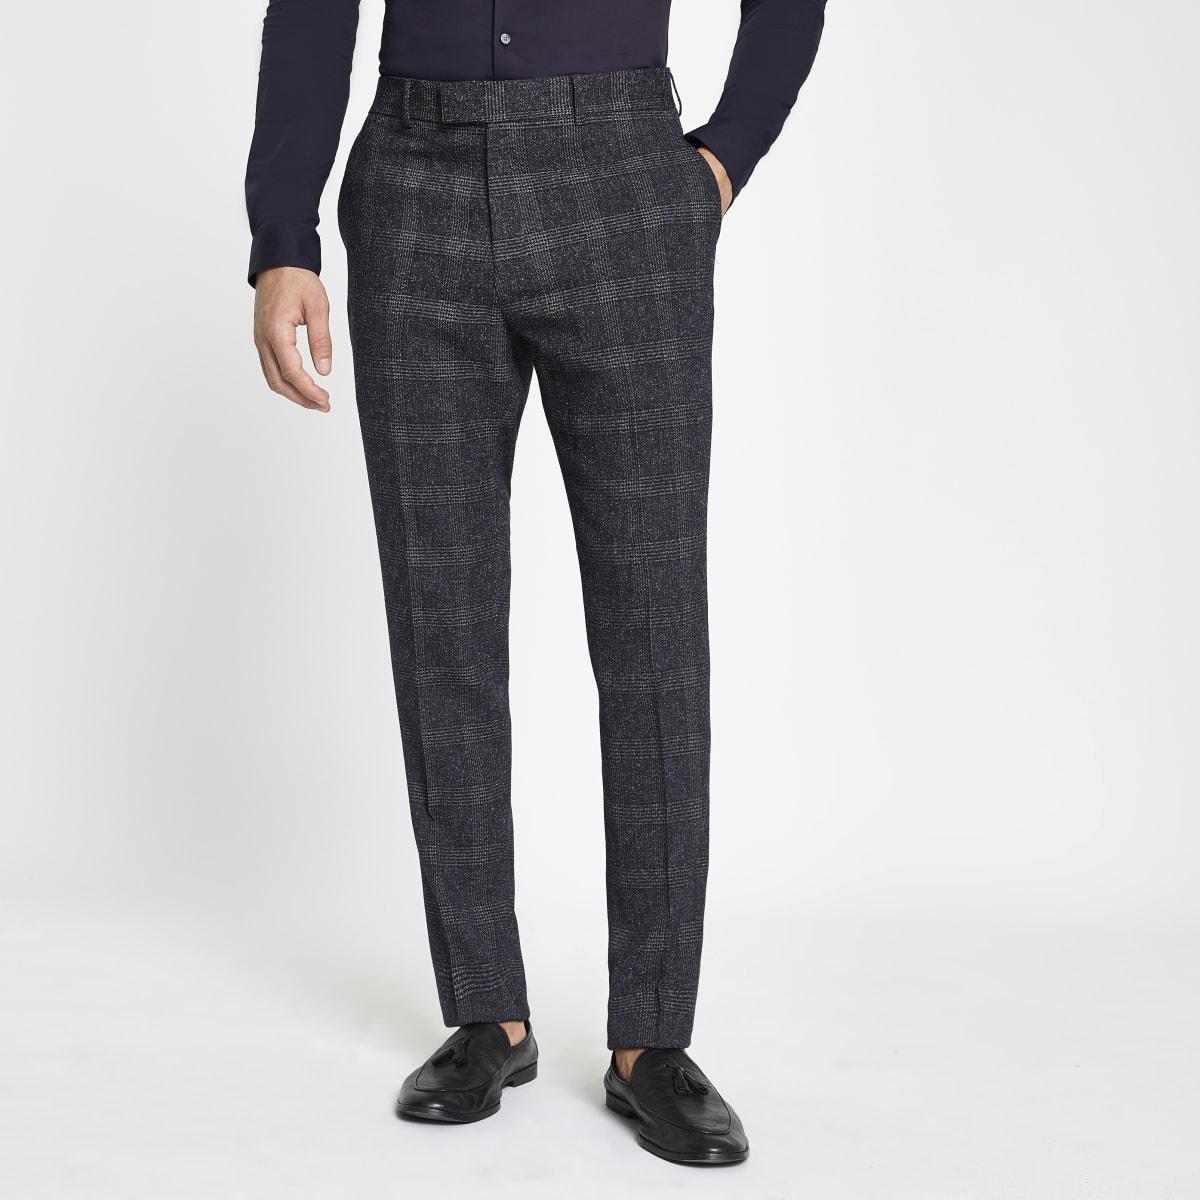 Farah blue check skinny suit trousers